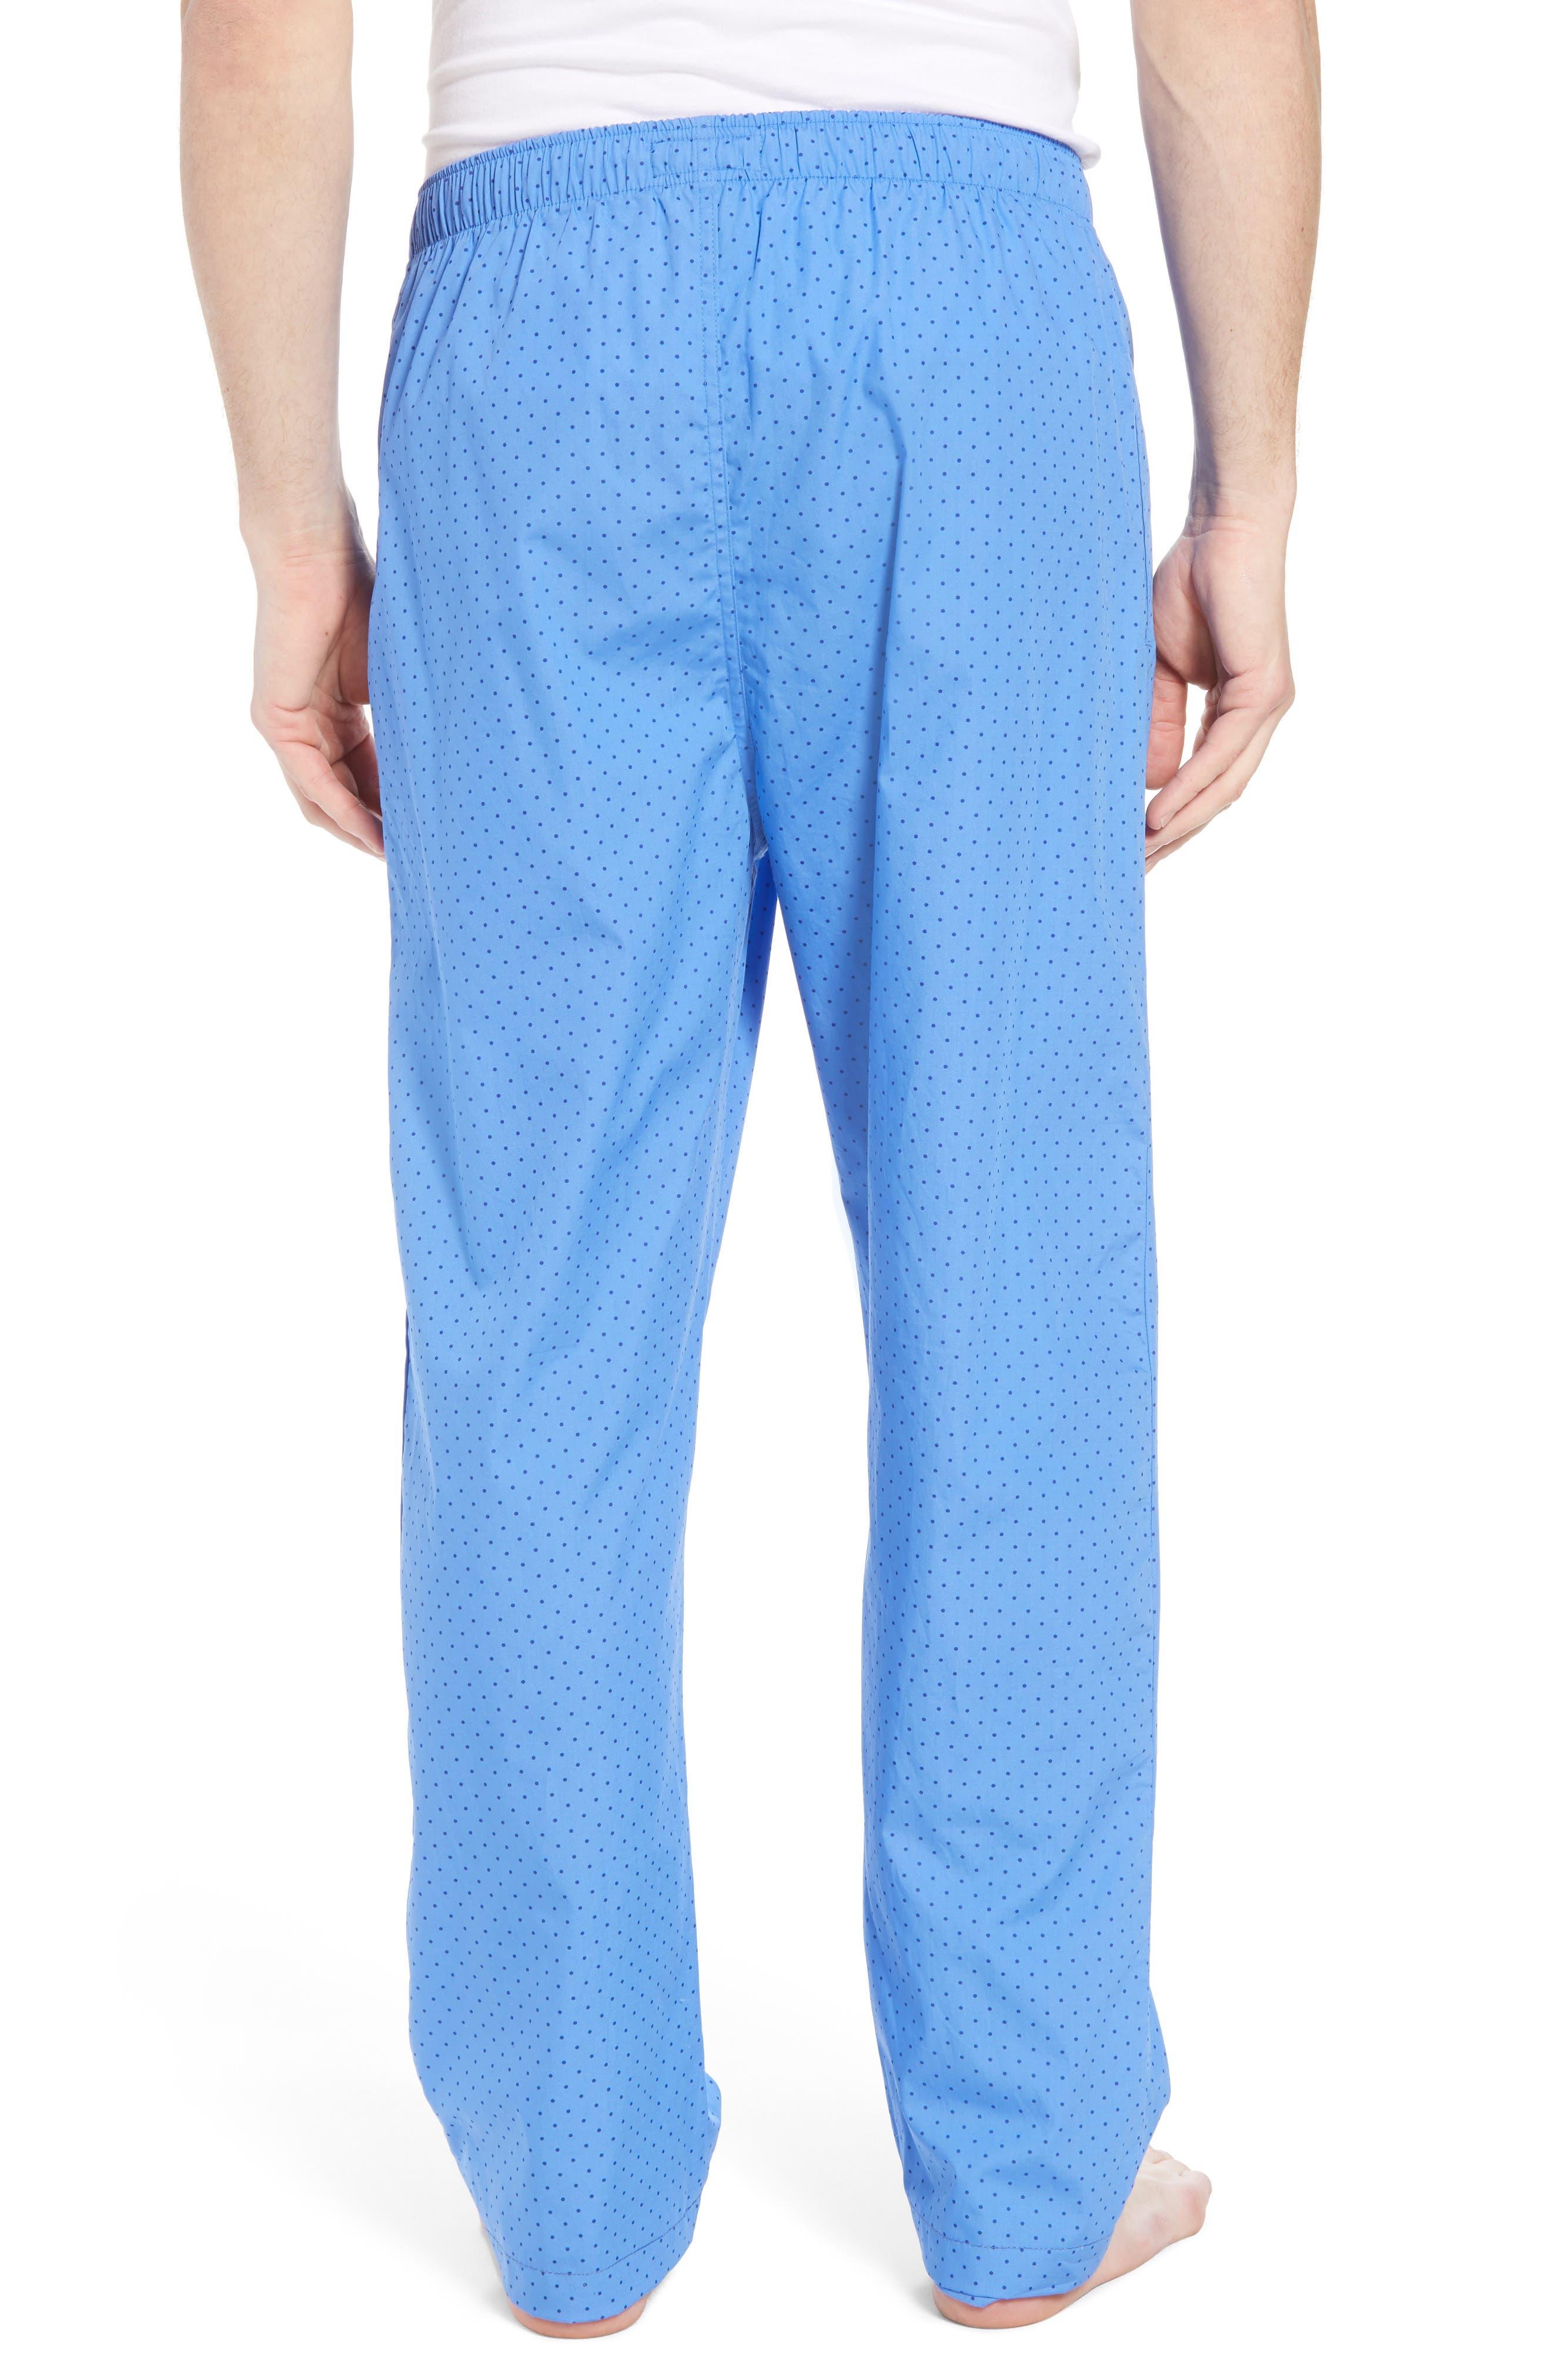 Dot Cotton Pajama Pants,                             Alternate thumbnail 2, color,                             451